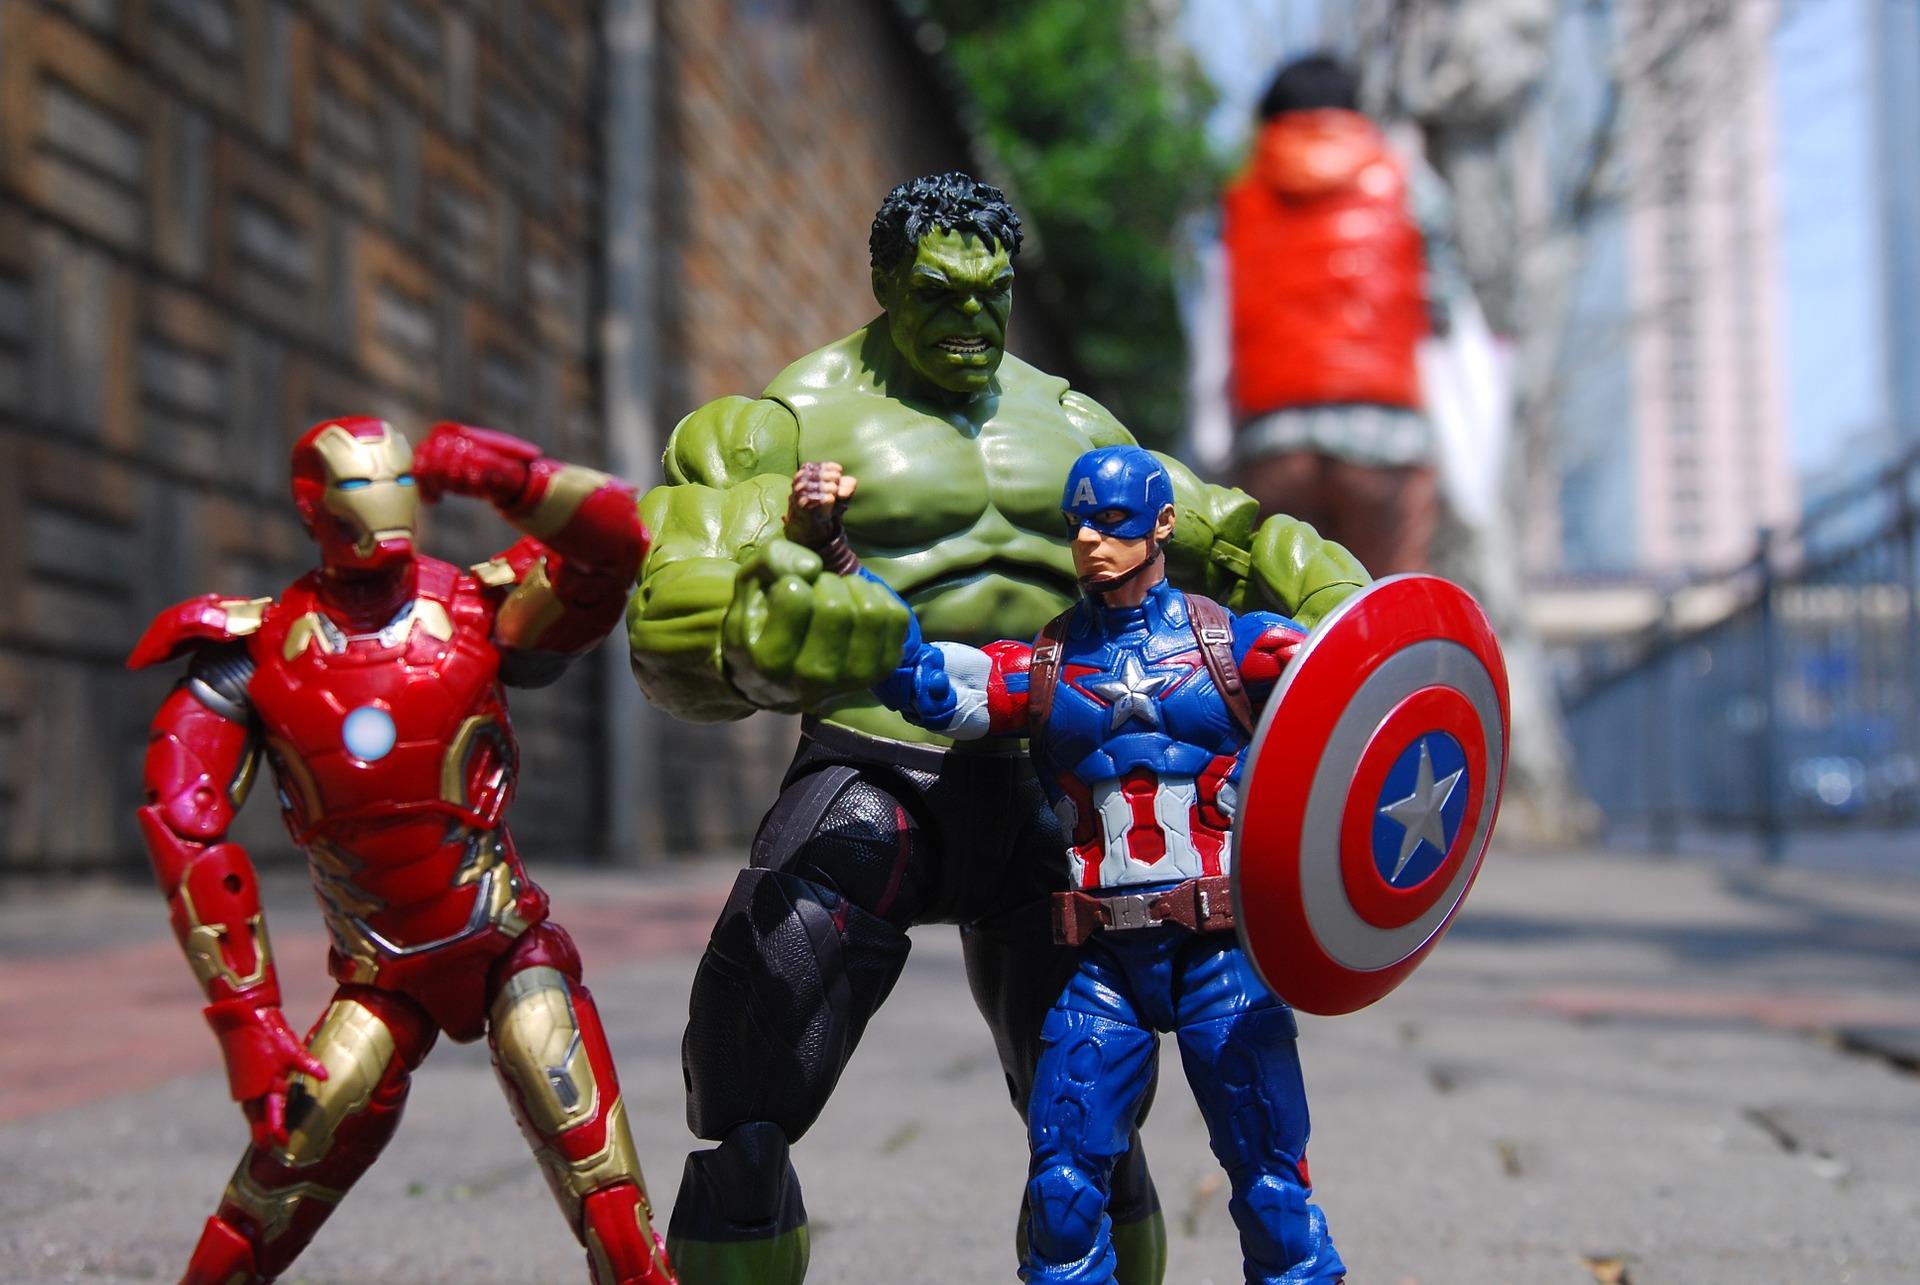 Marvel comics lovers